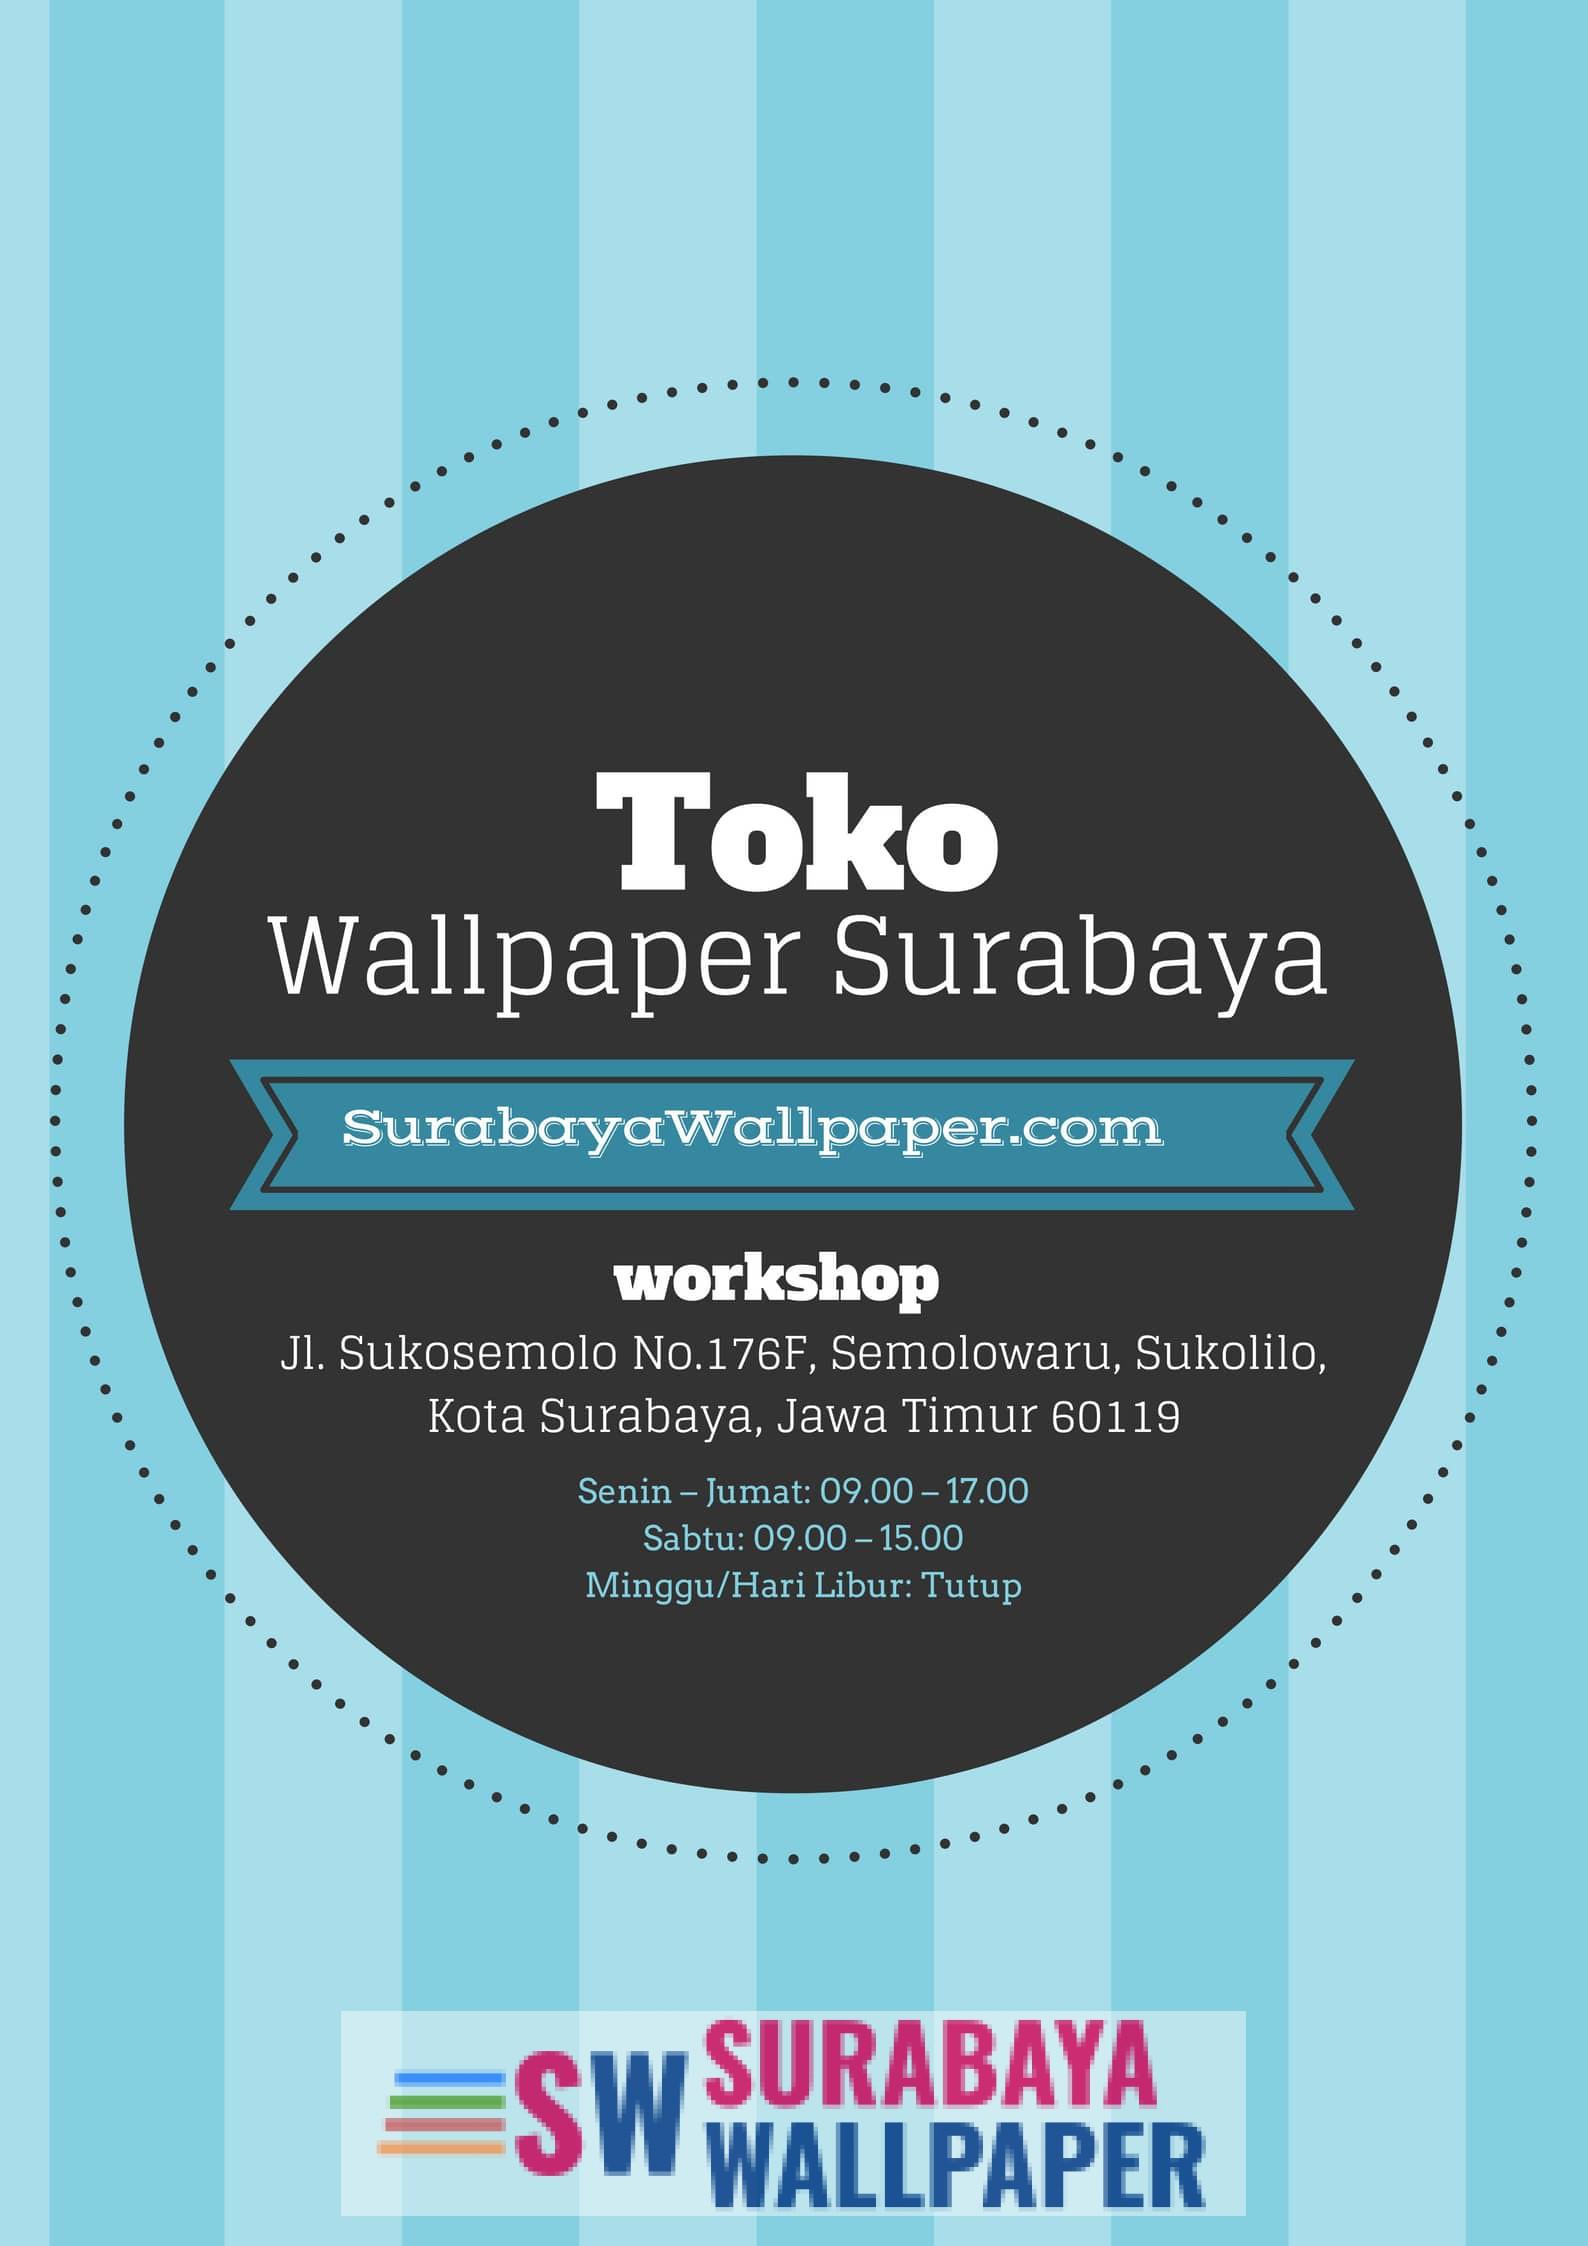 toko wallpaper surabaya